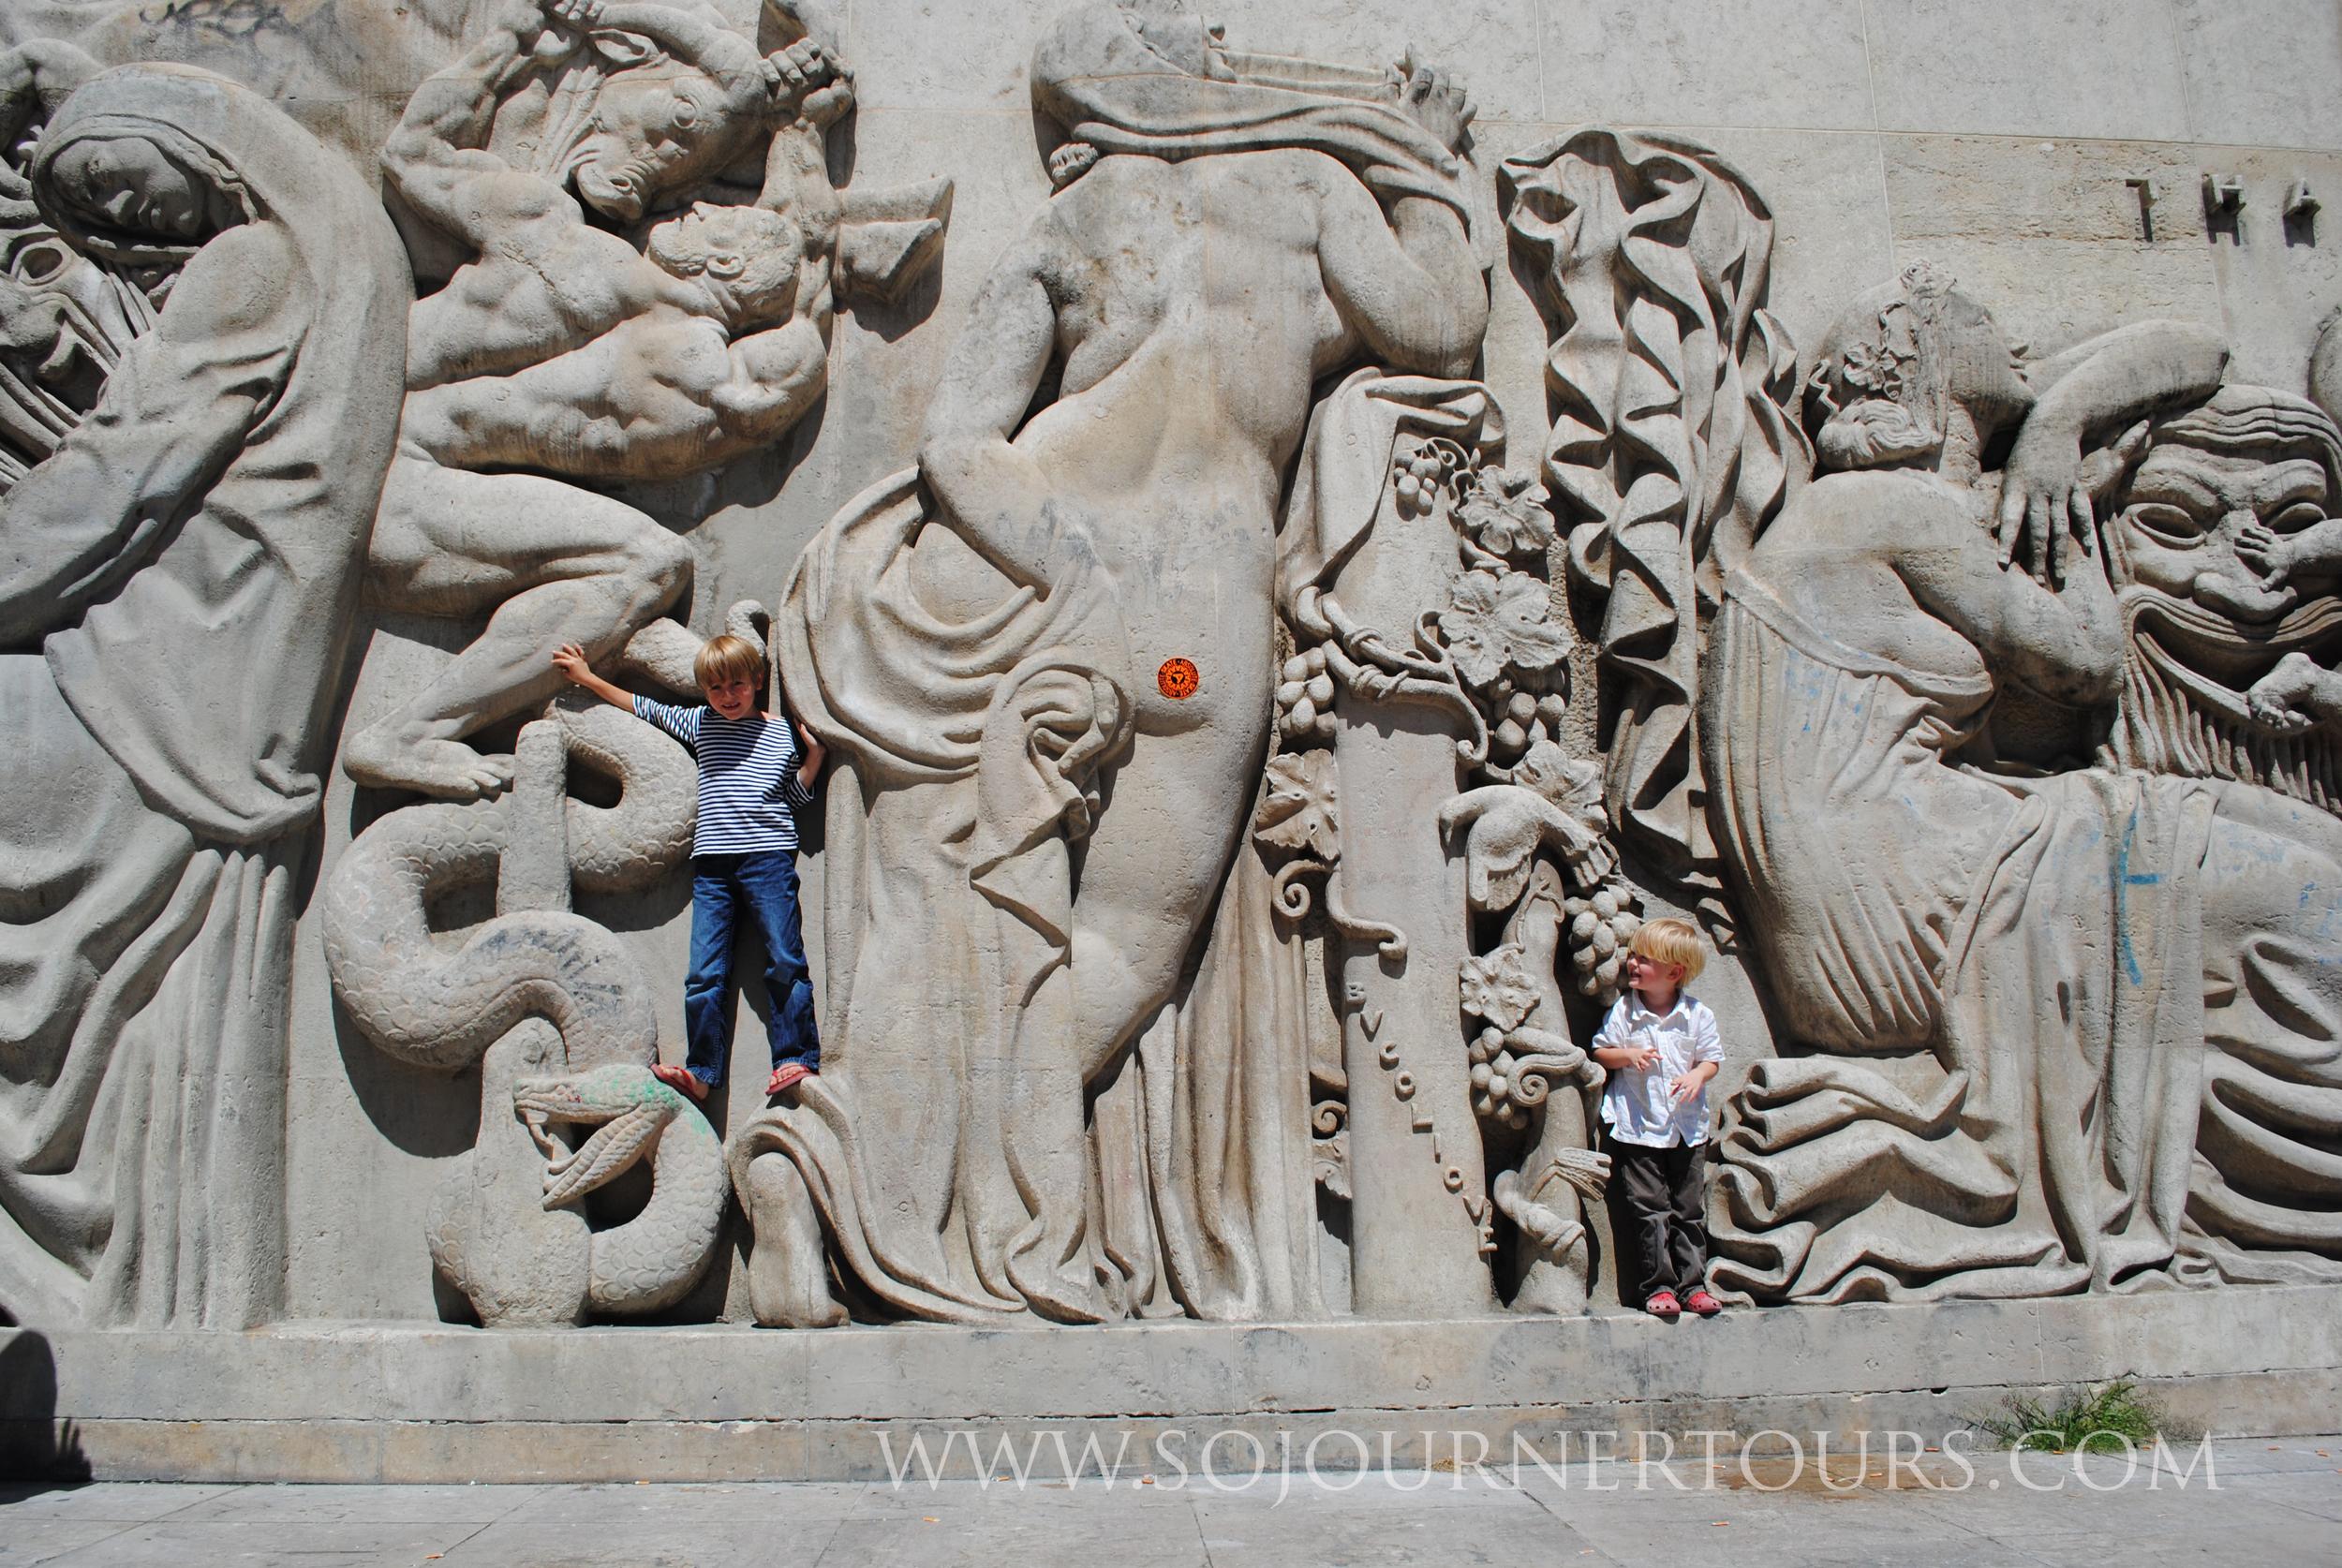 Paris Family Tour: Museum of Modern Art